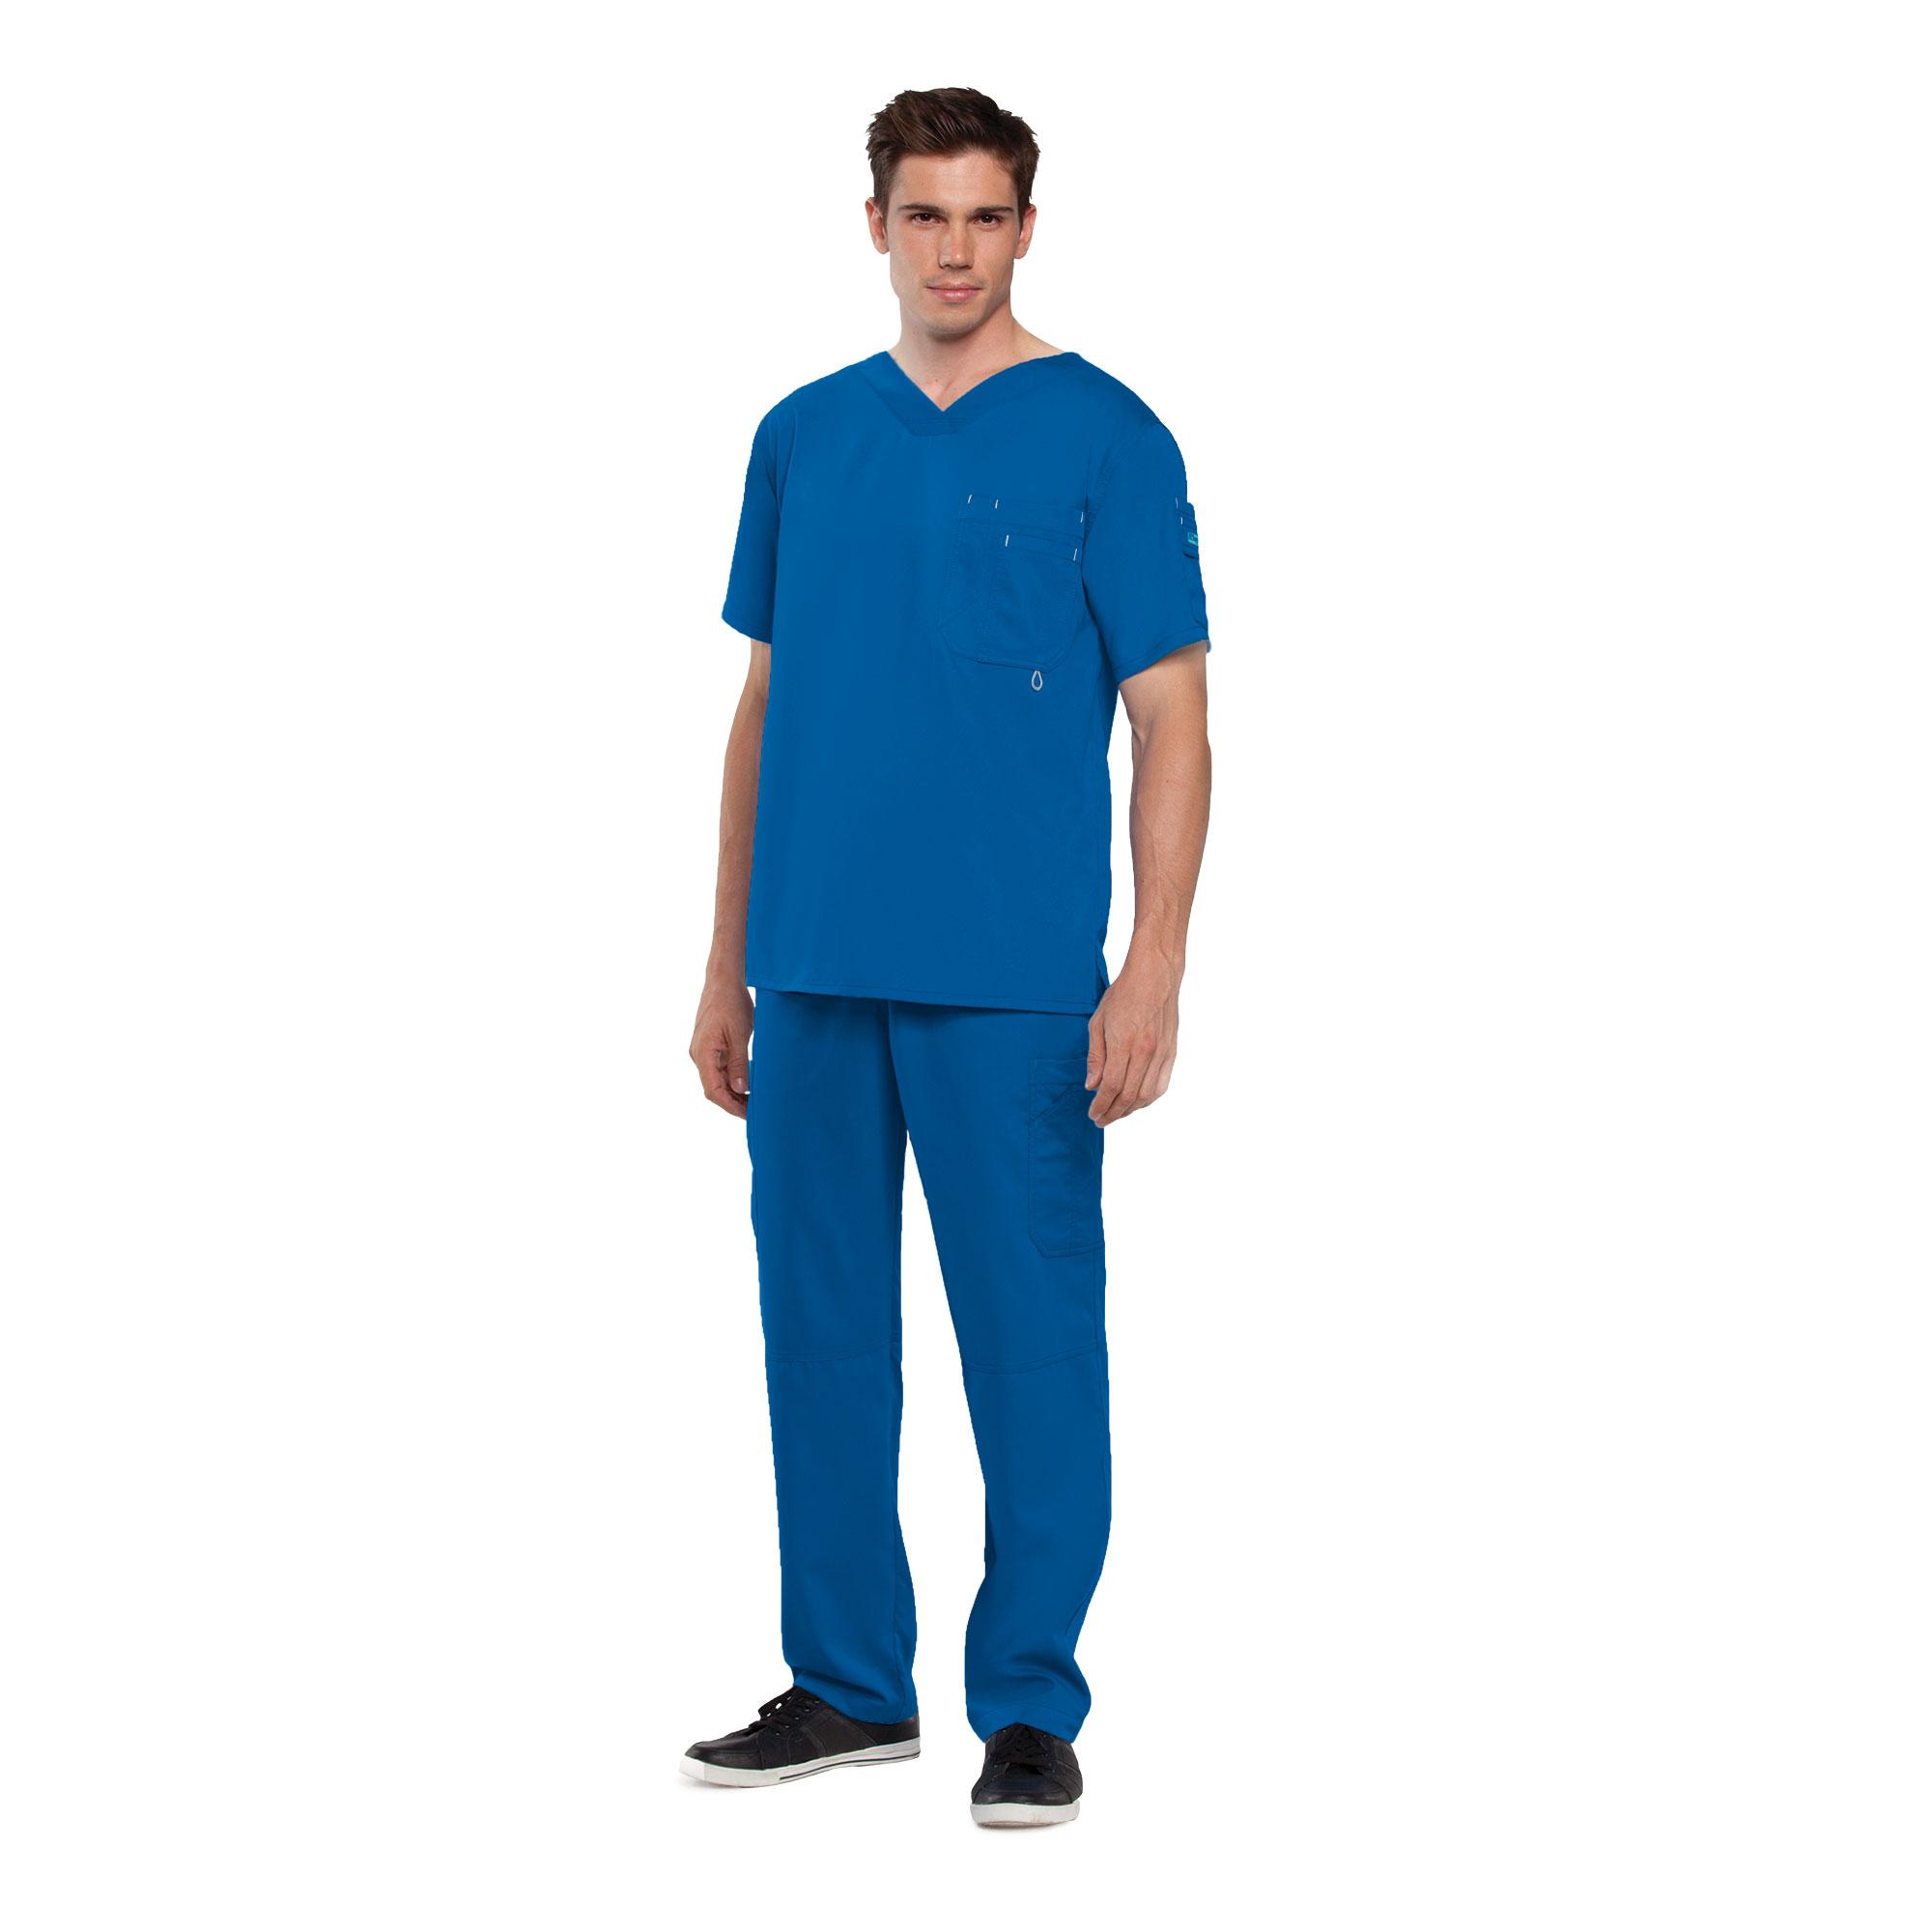 Buy 3 Pocket High Open V Neck Greys Anatomy Online At Best Price Il